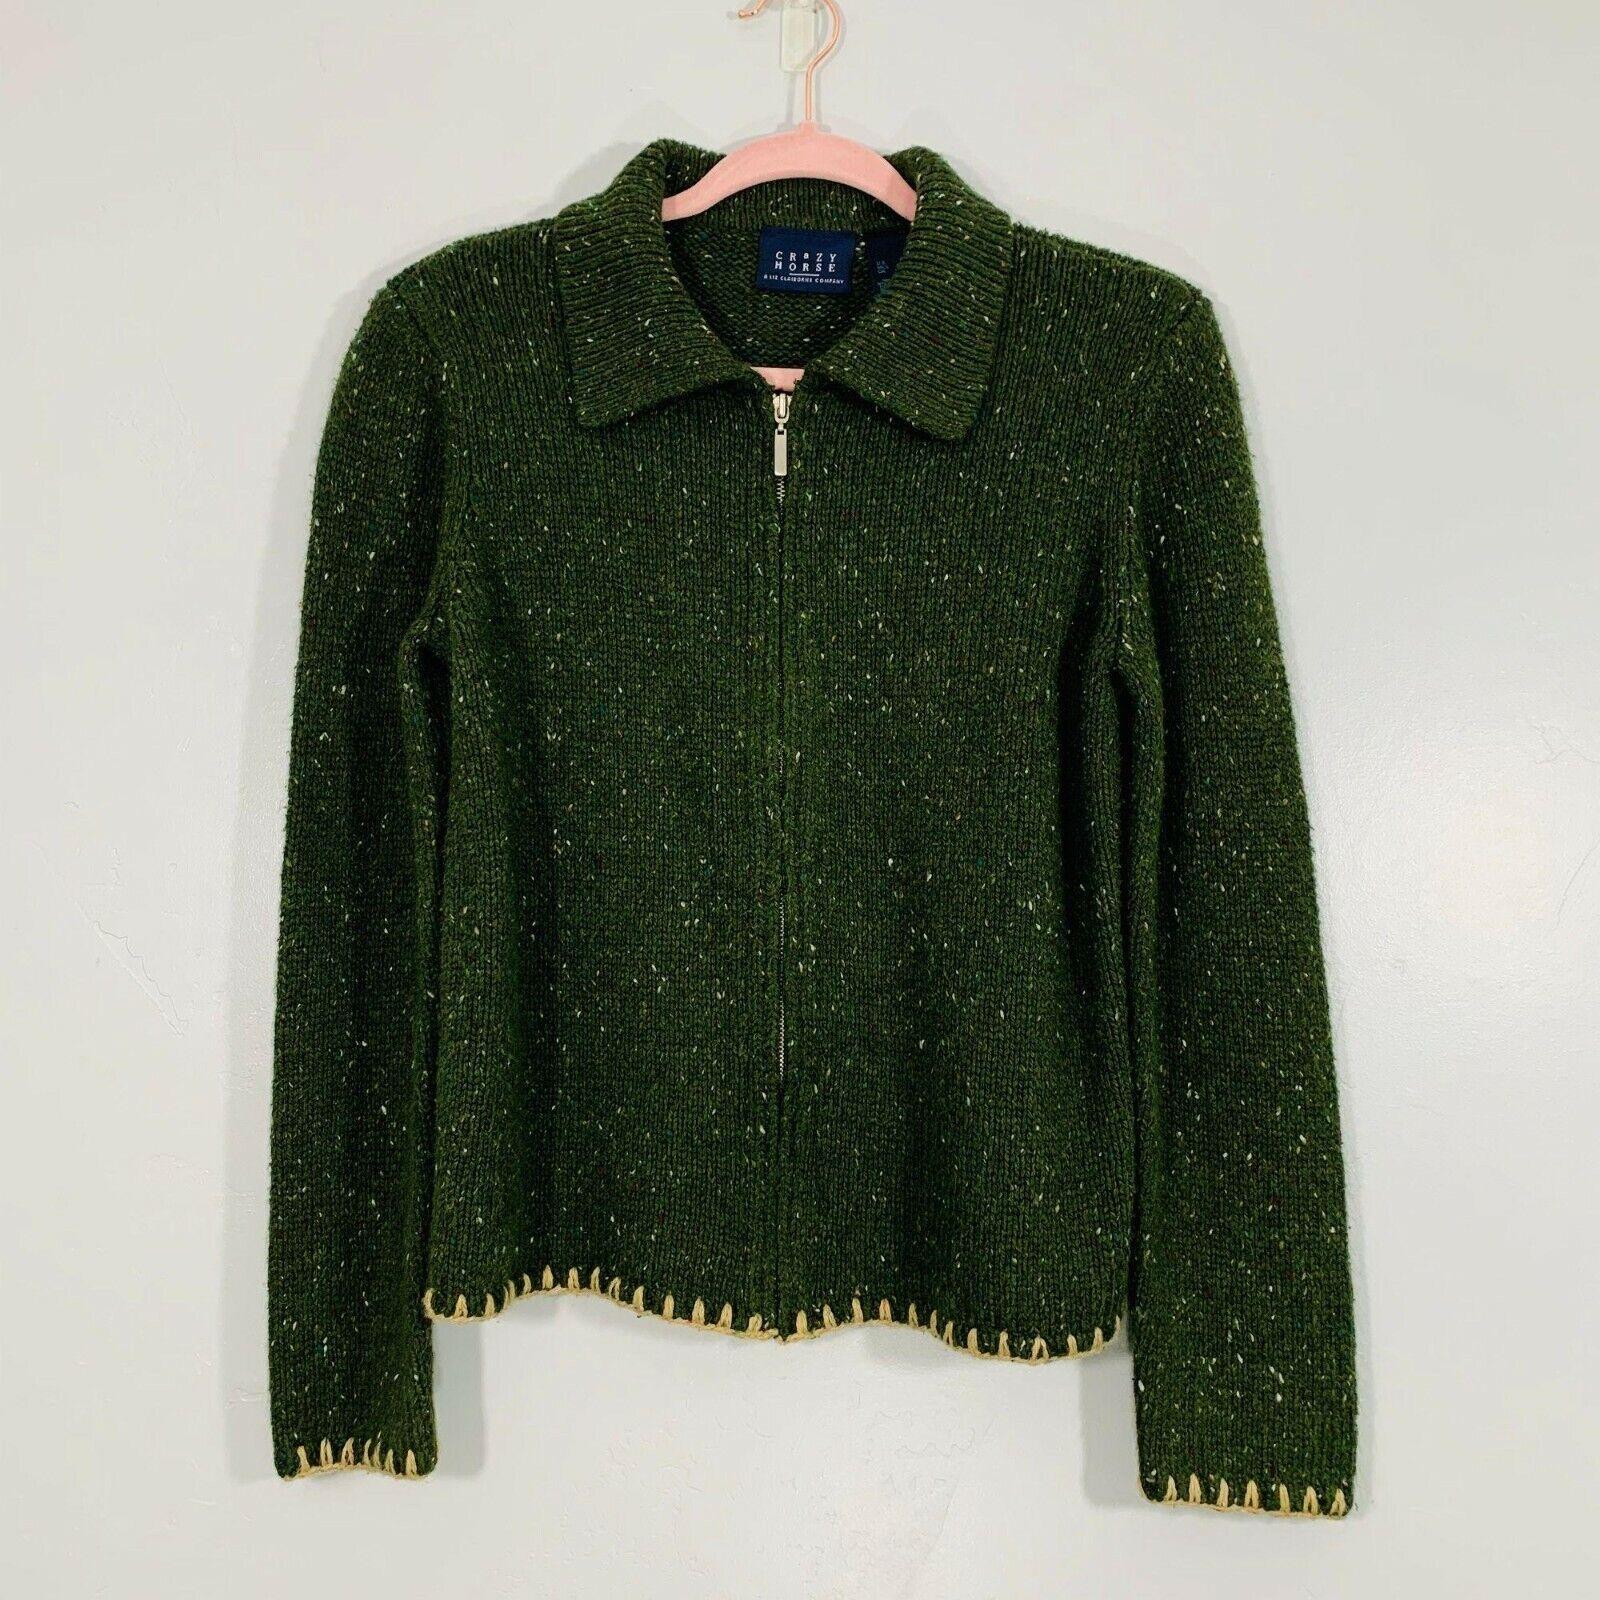 Vintage 90's Crazy Horse Green Spickled Knit Long Sleeve Zip Up Sweater Jacket